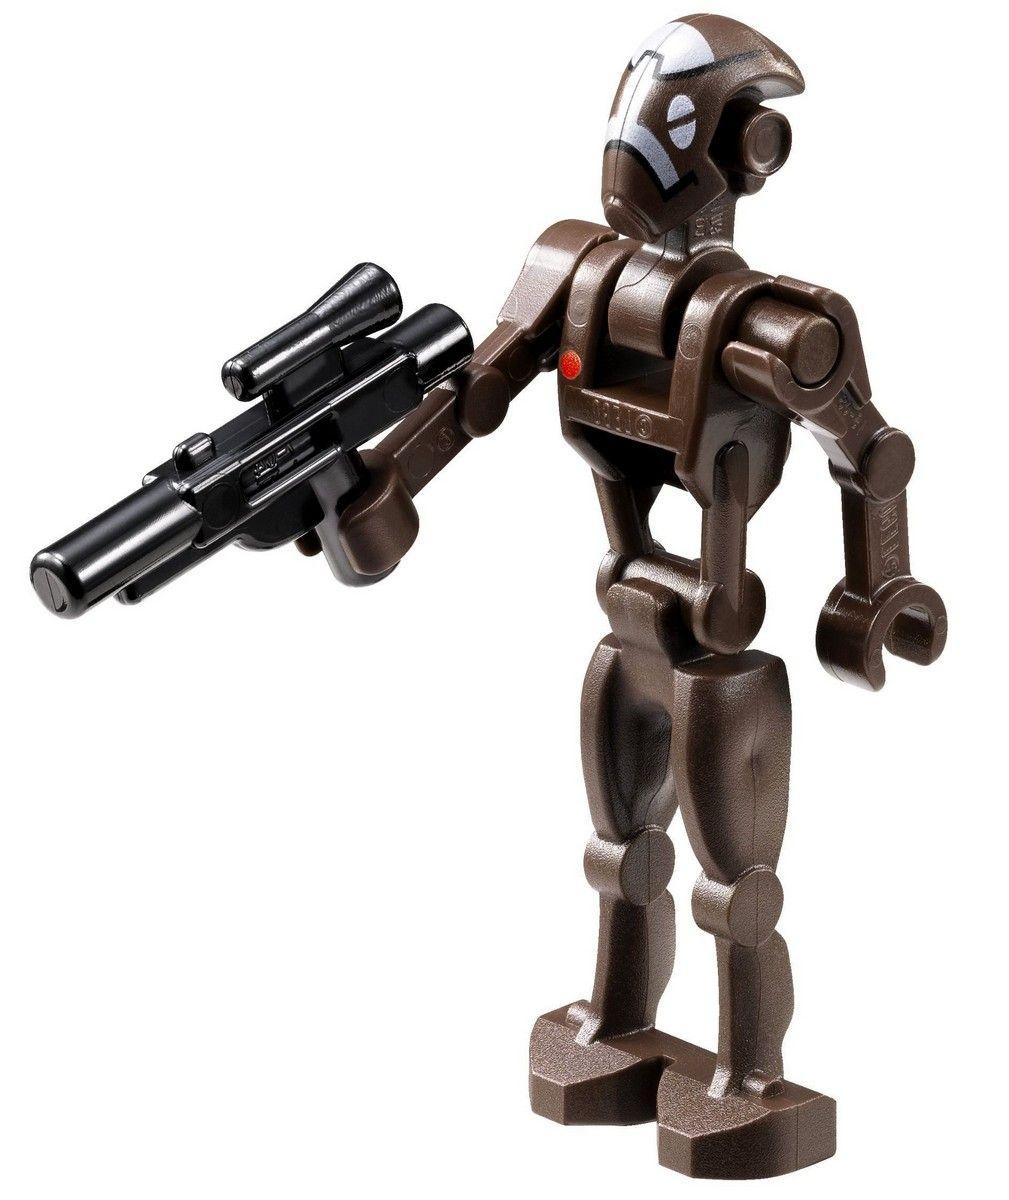 Lego 75002 at rt i brick city - Lego star wars base droide ...